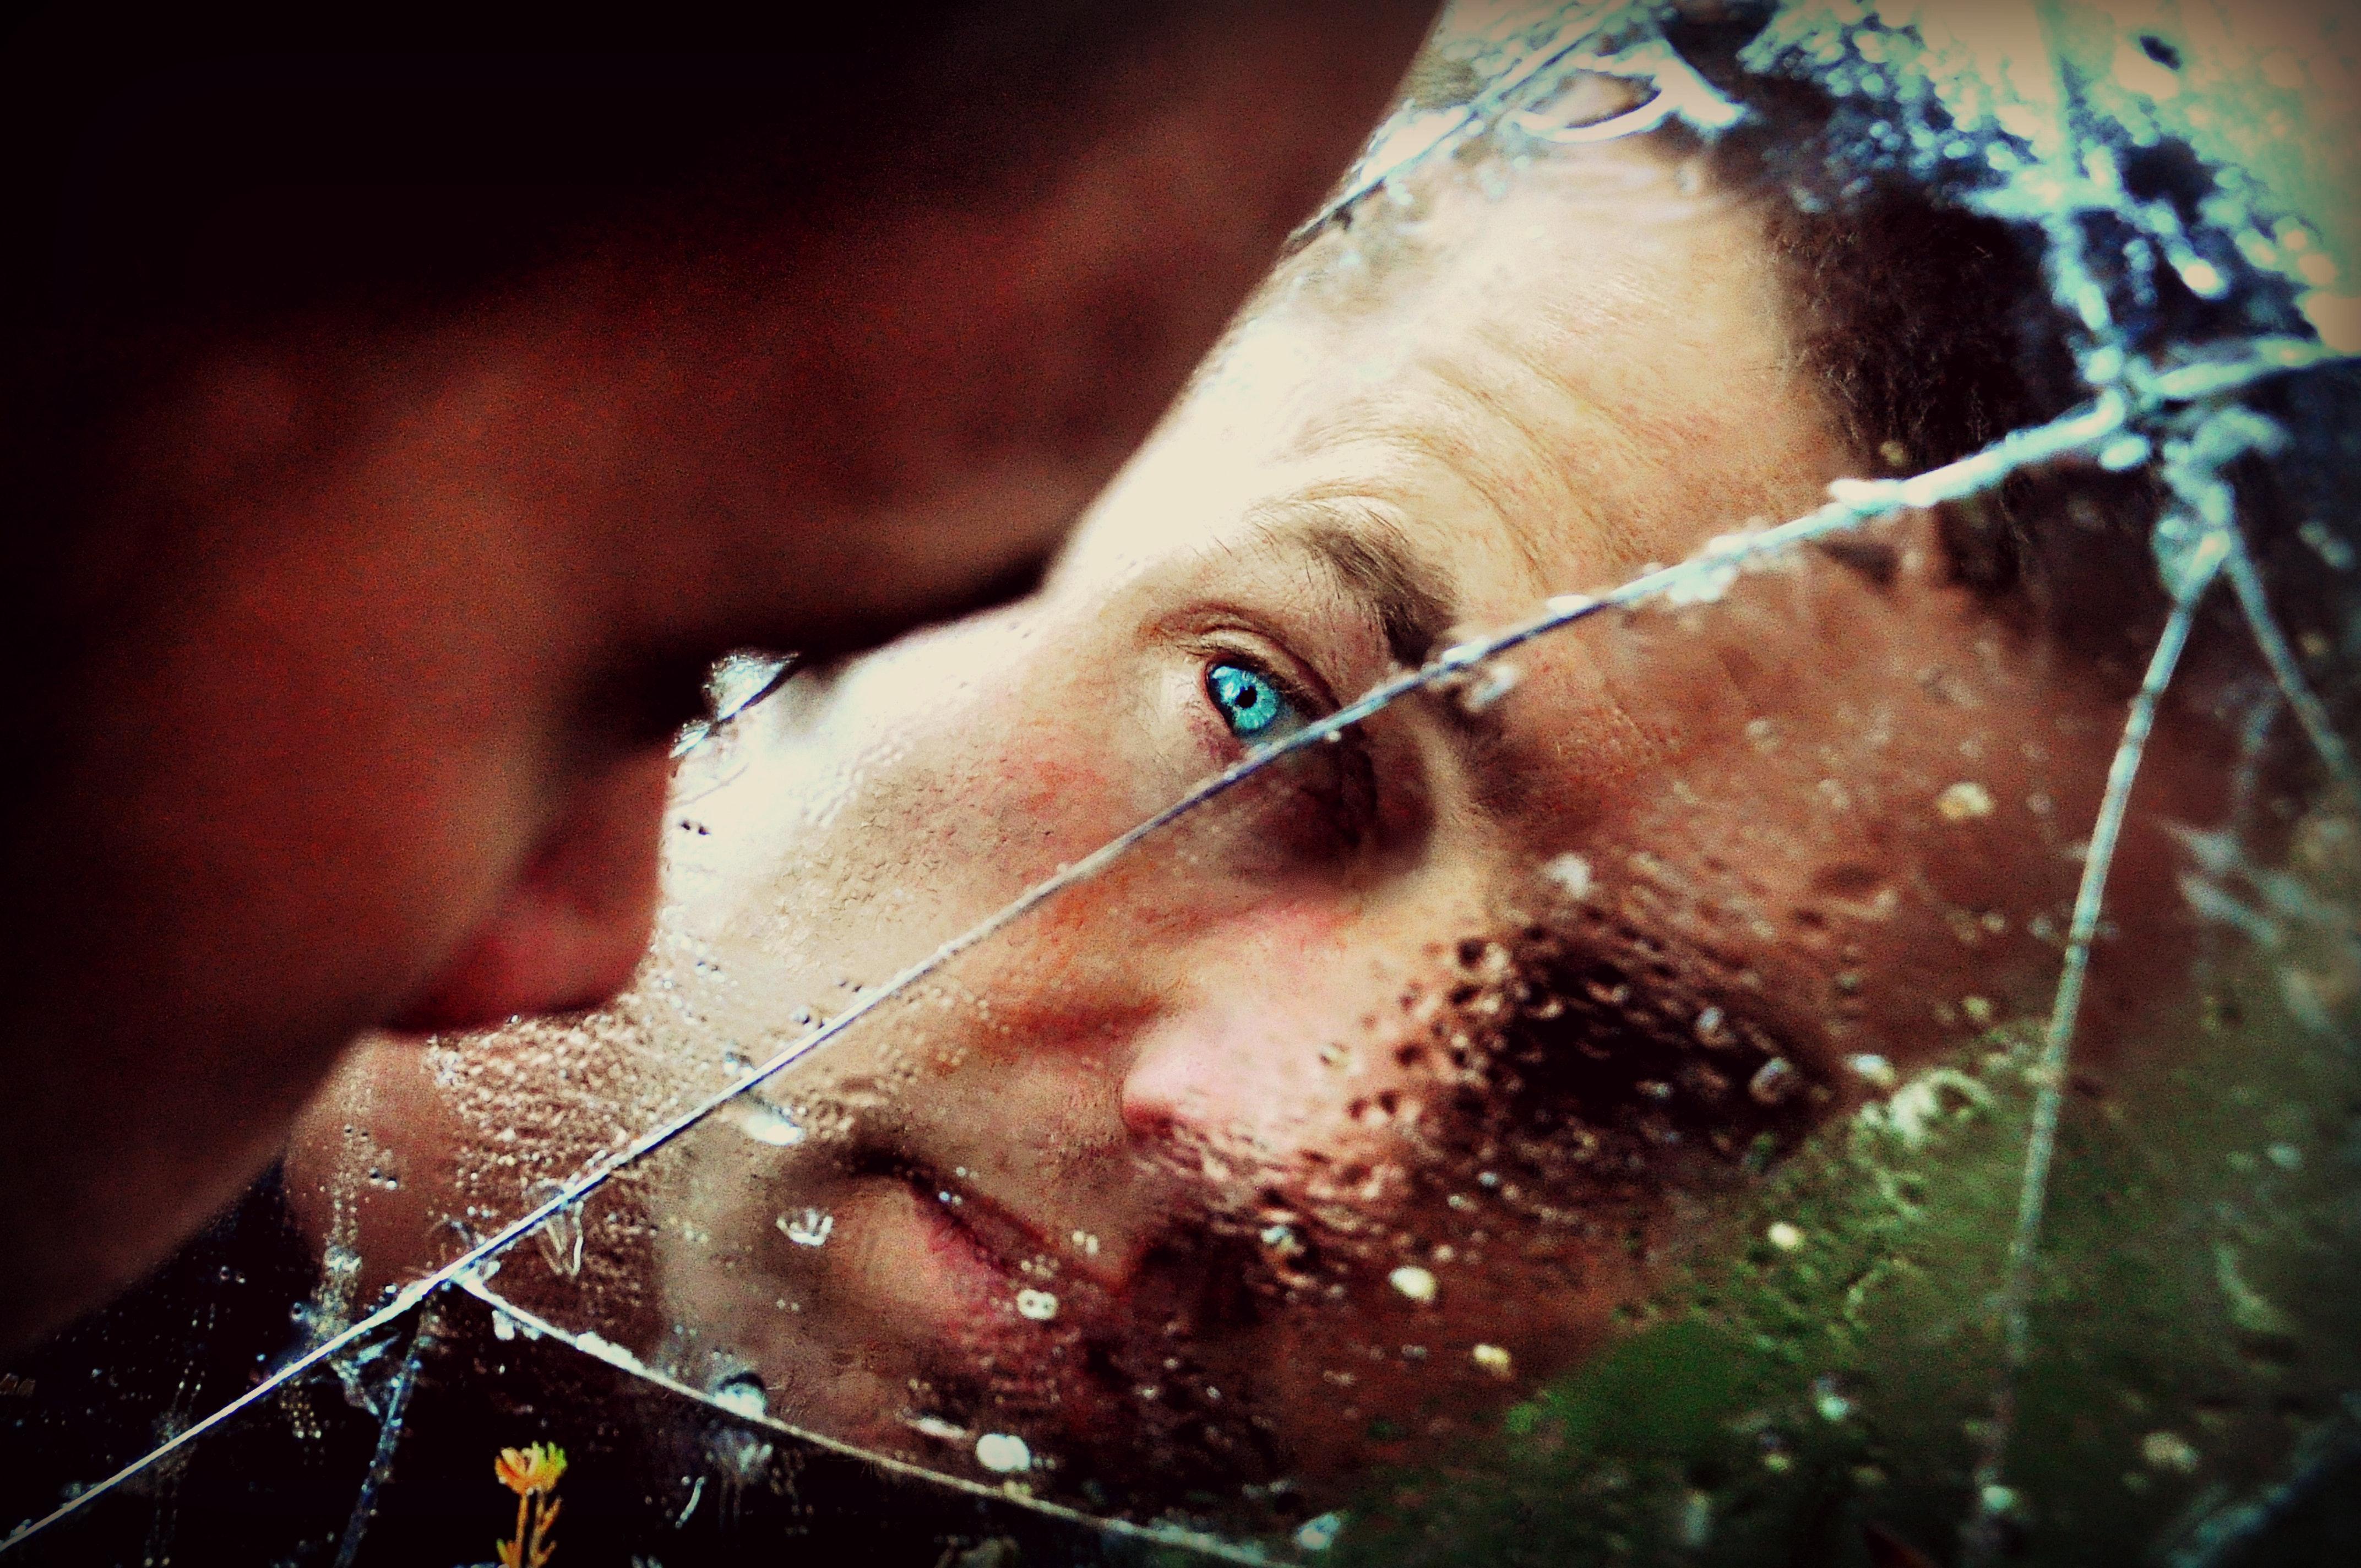 Blue eyed man staring at the mirror photo